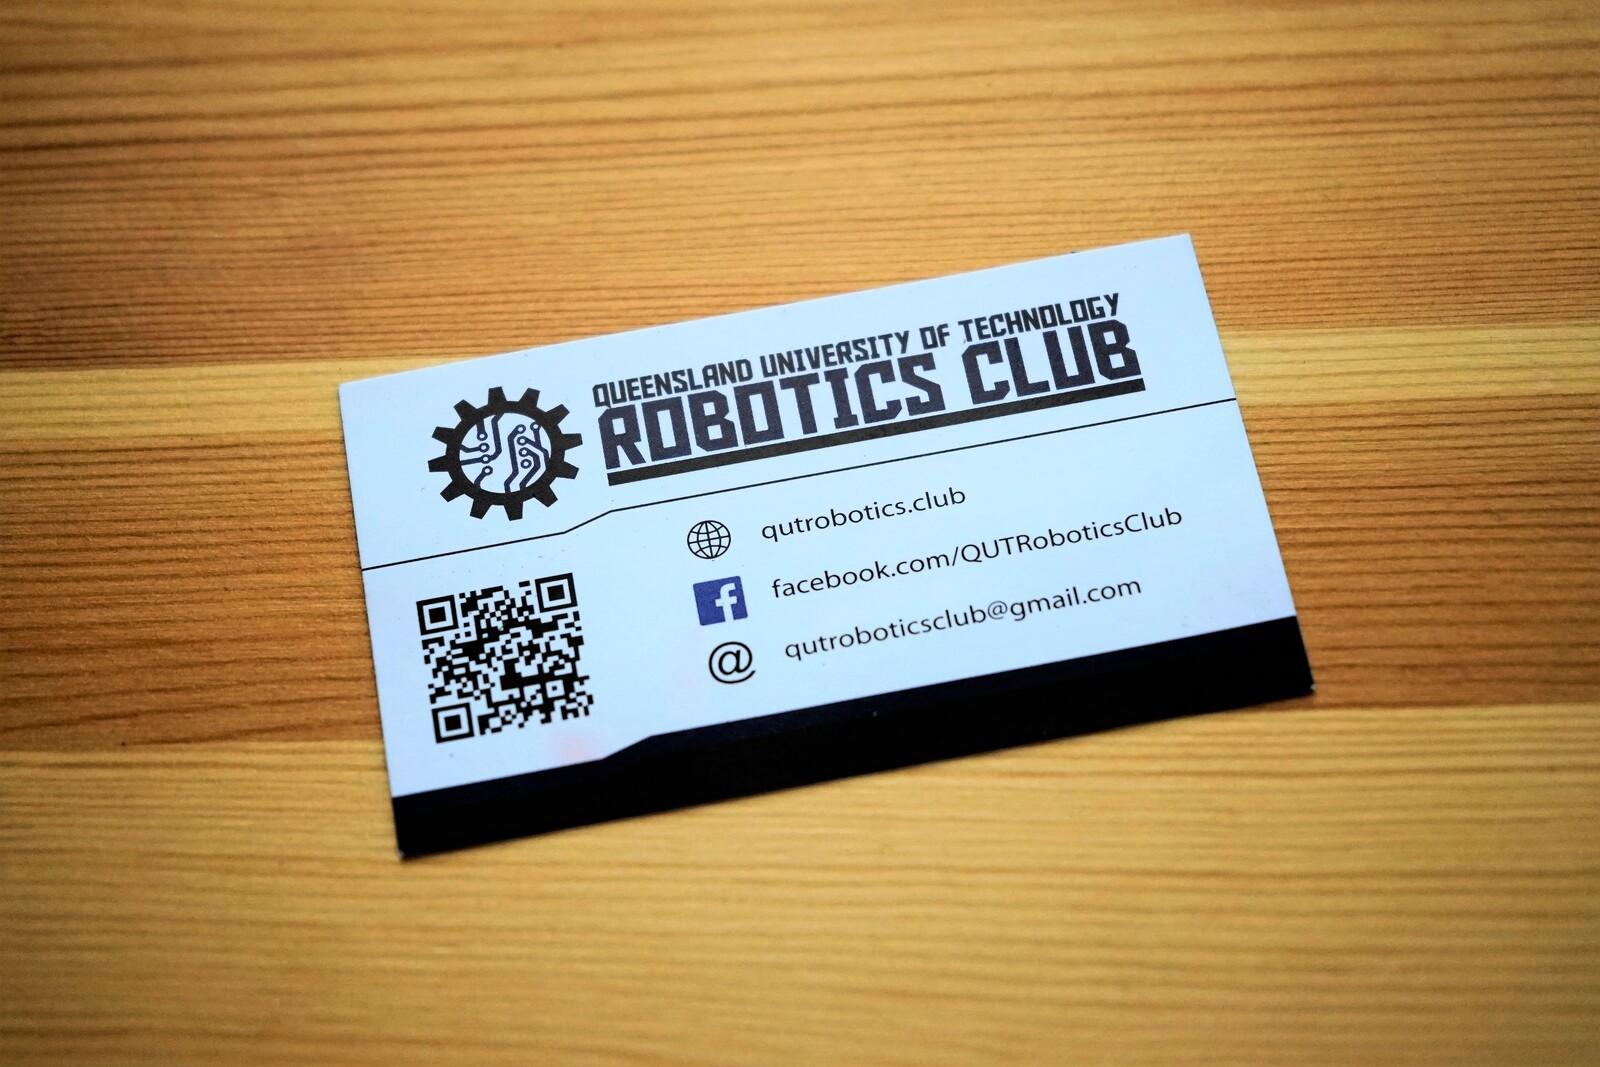 QUT Robotics Club Business Cards